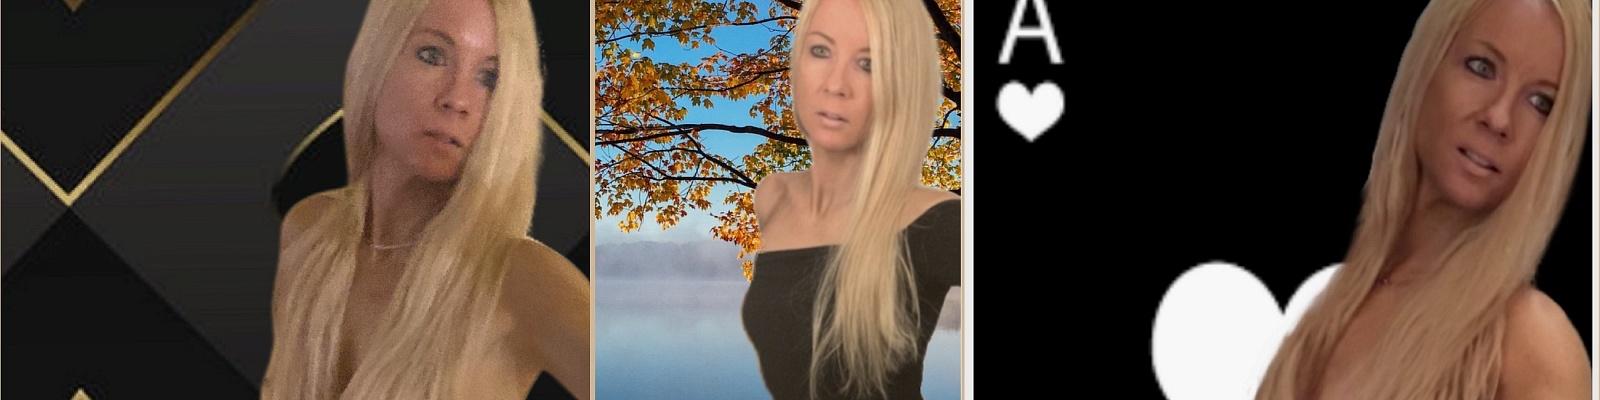 Tantric Hazel Edwards's Cover Photo